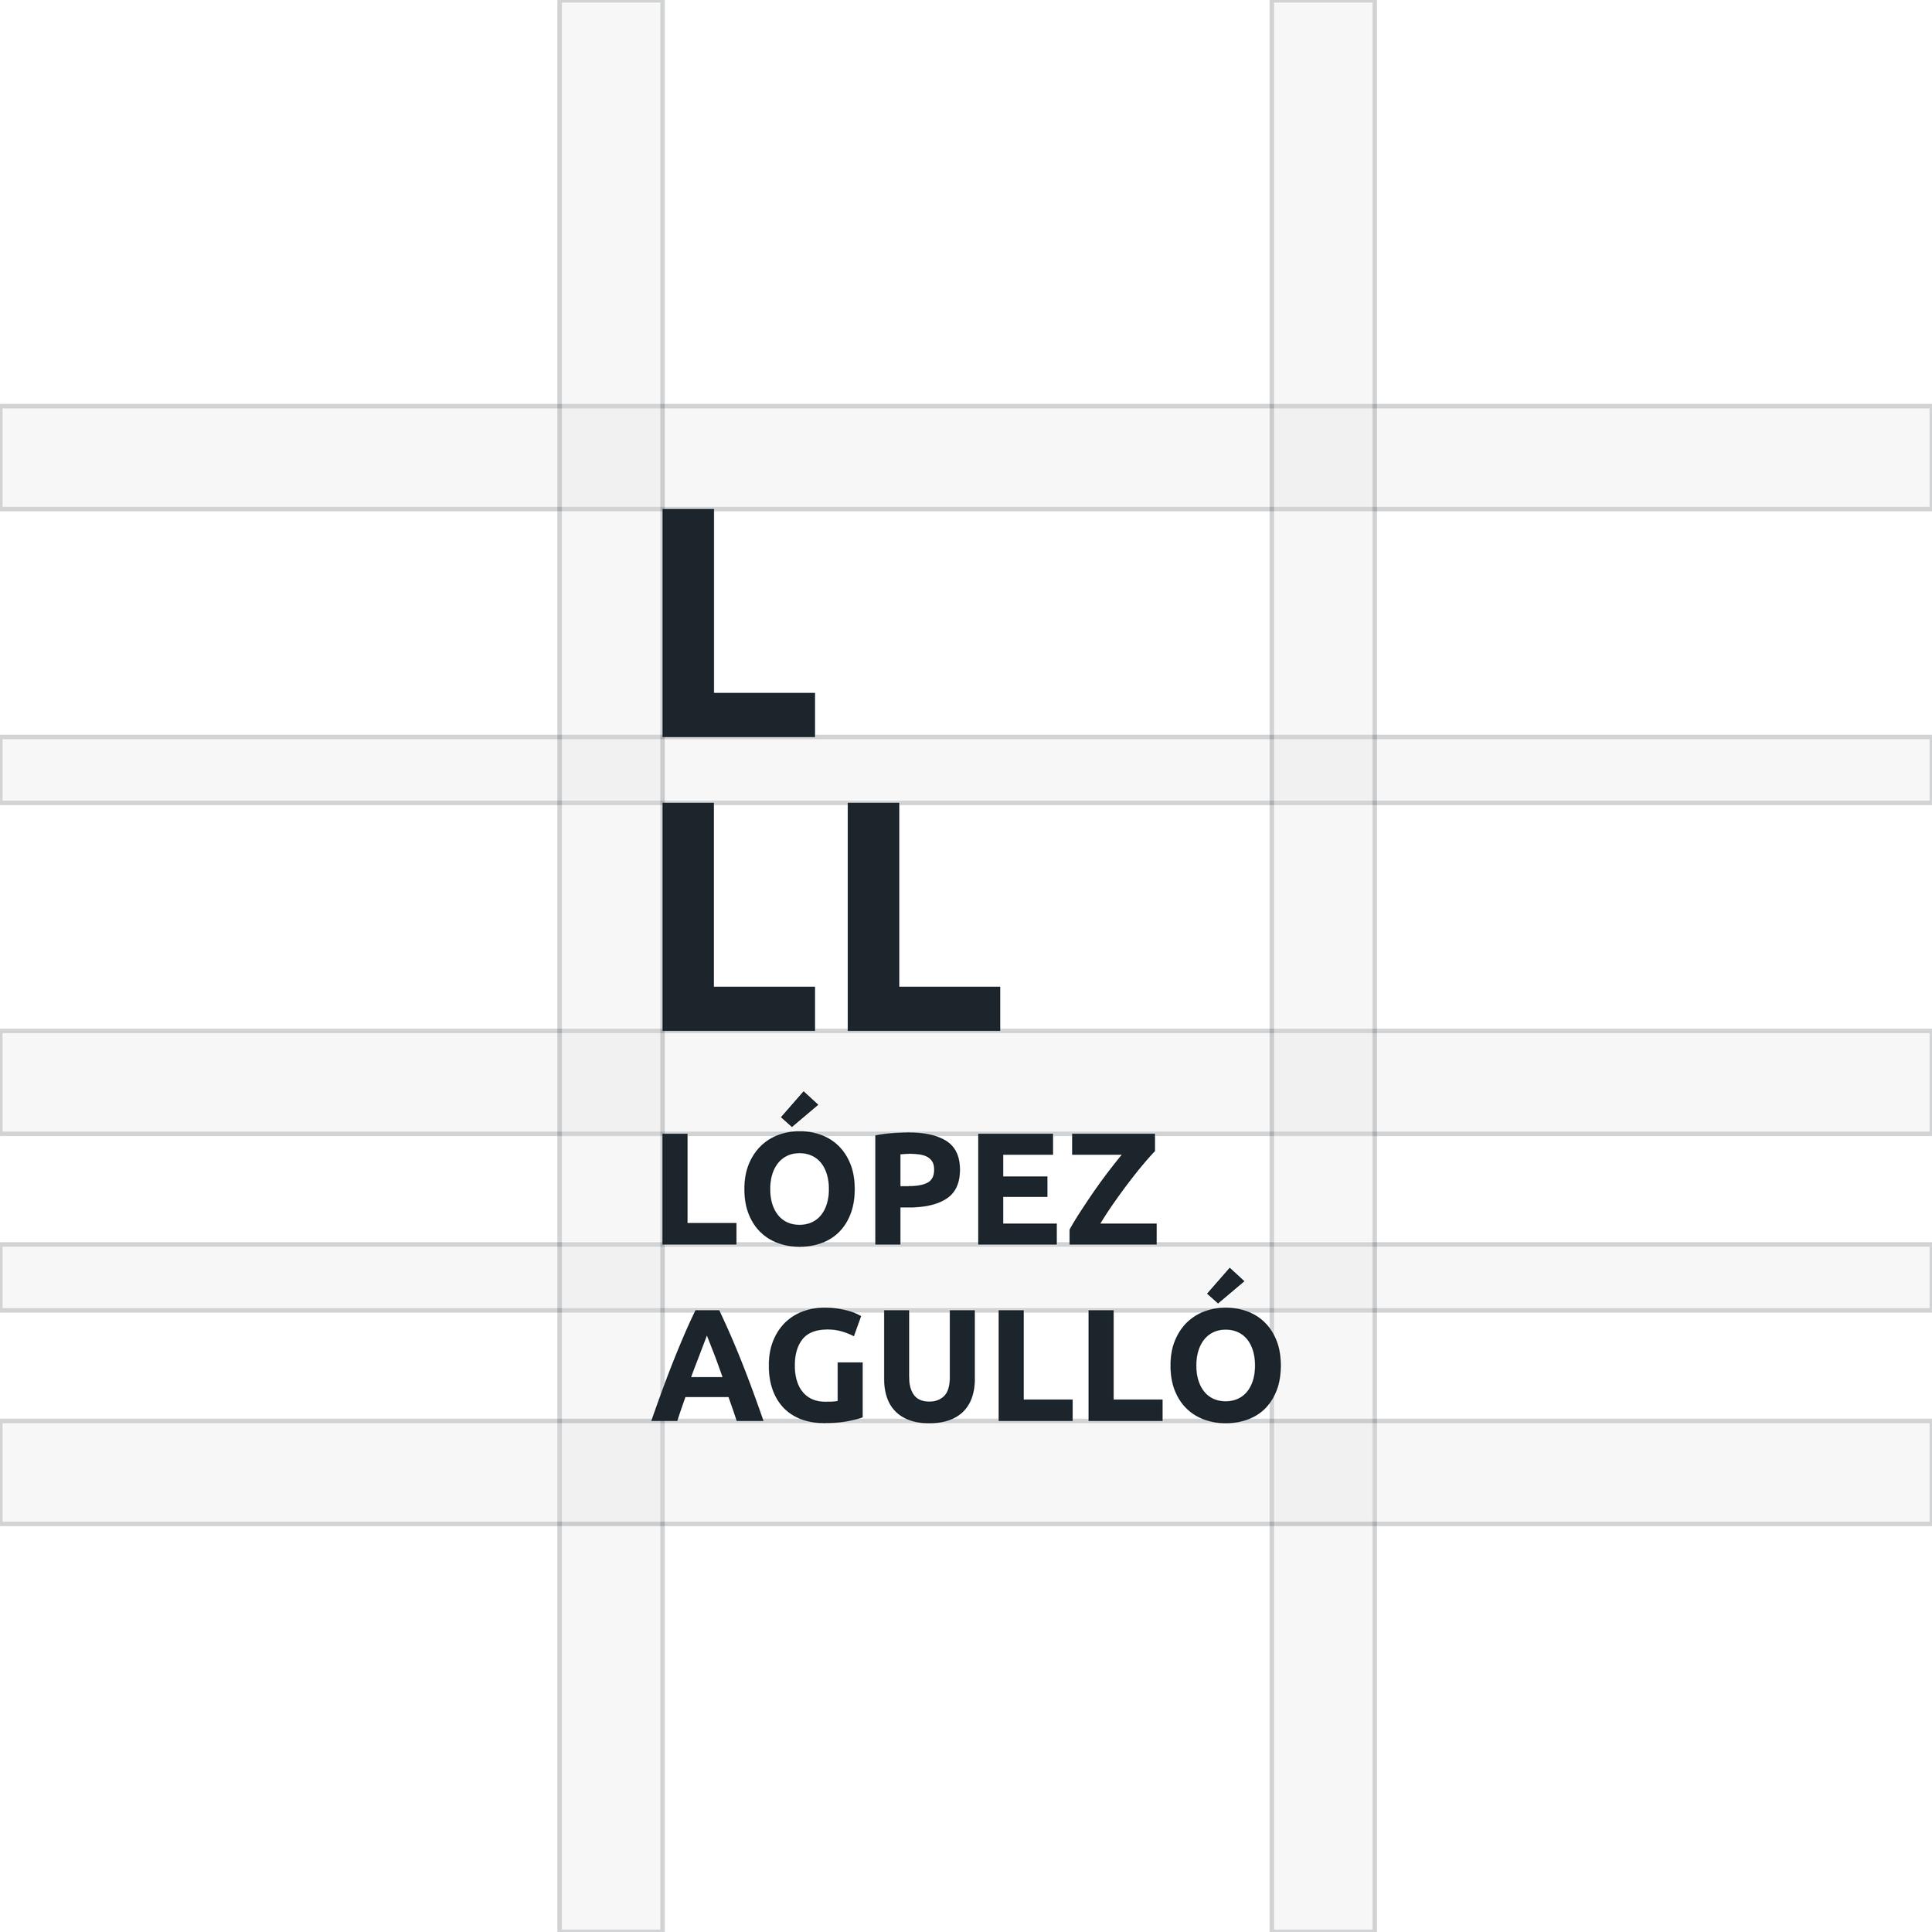 Superfluido - López Agulló3.png